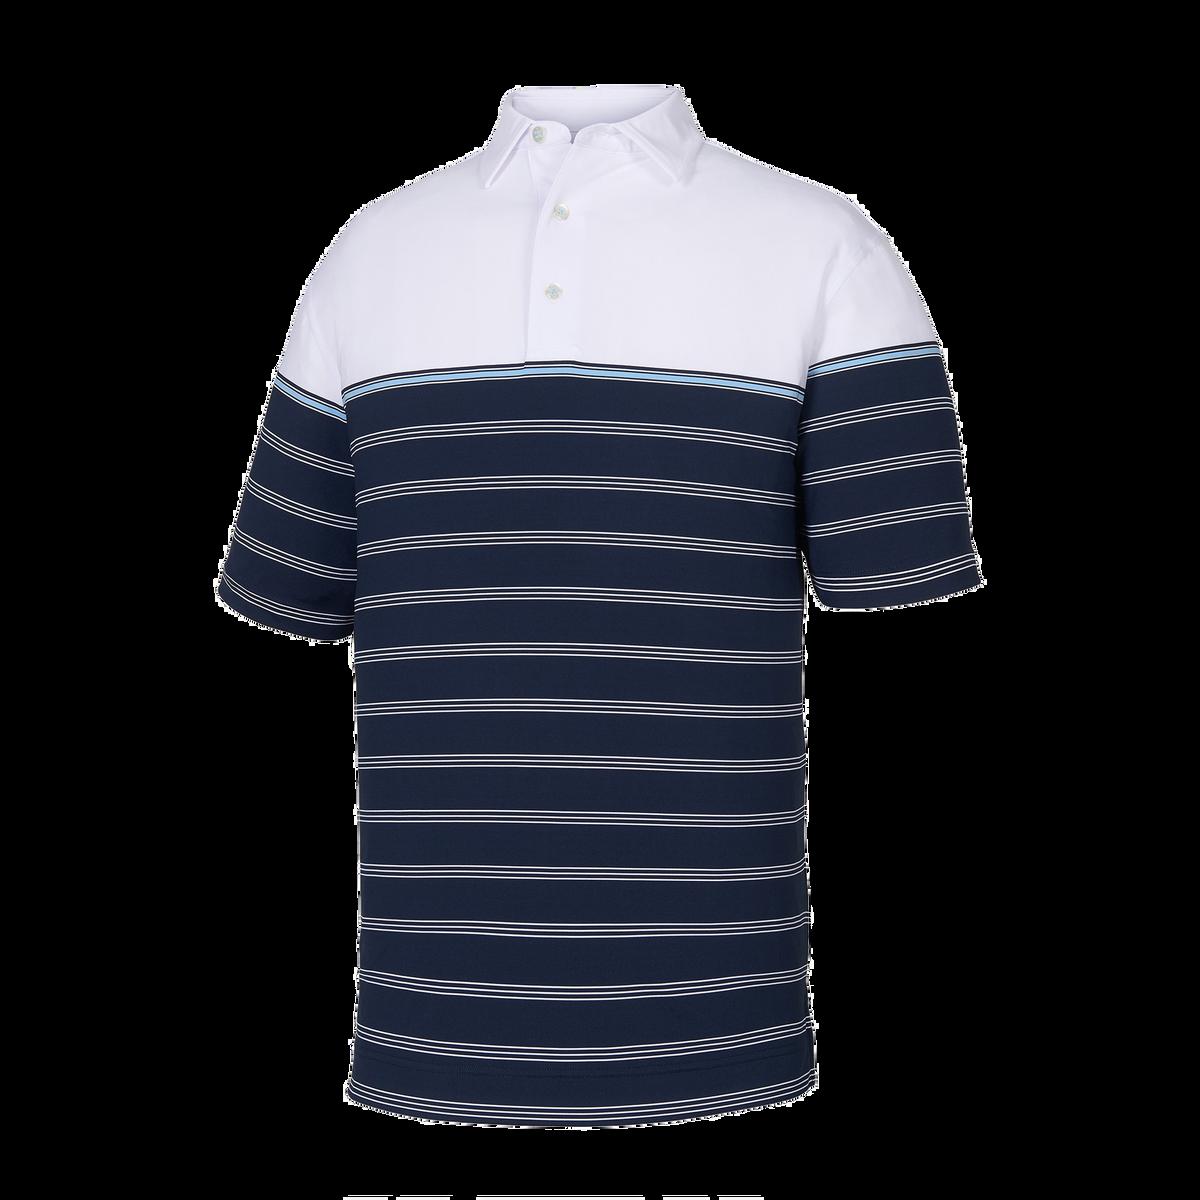 Lisle Colorblock Stripe Self Collar-Previous Season Style